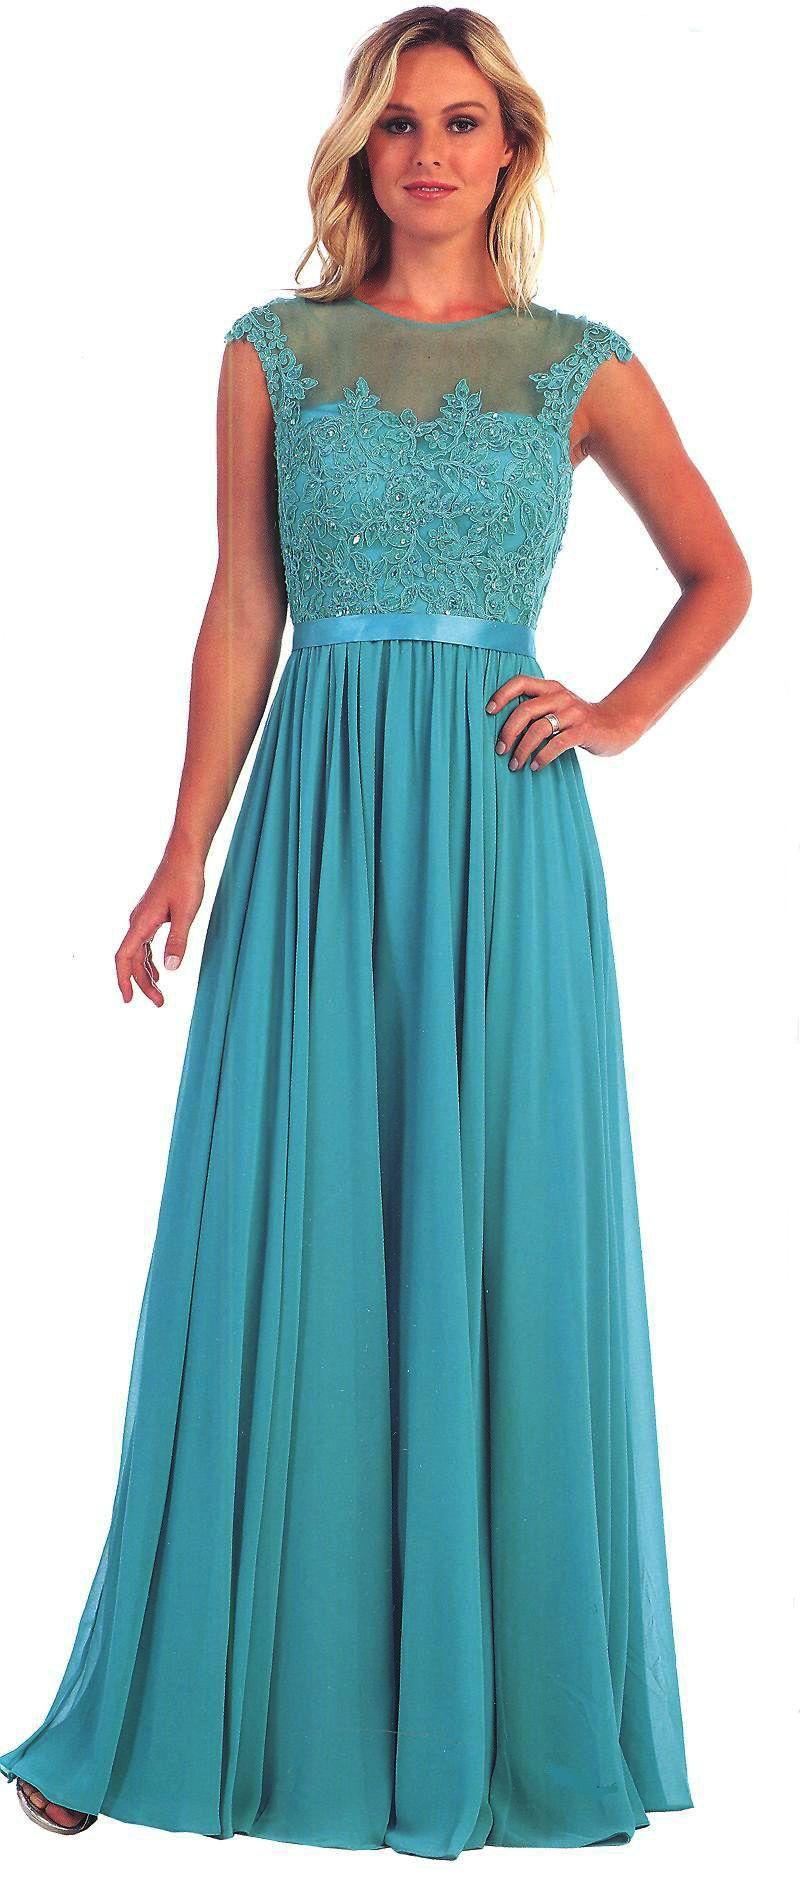 Evening Dresses Ball Dresses UNDER $200<BR>afa29016<BR>Chiffon maxi ...